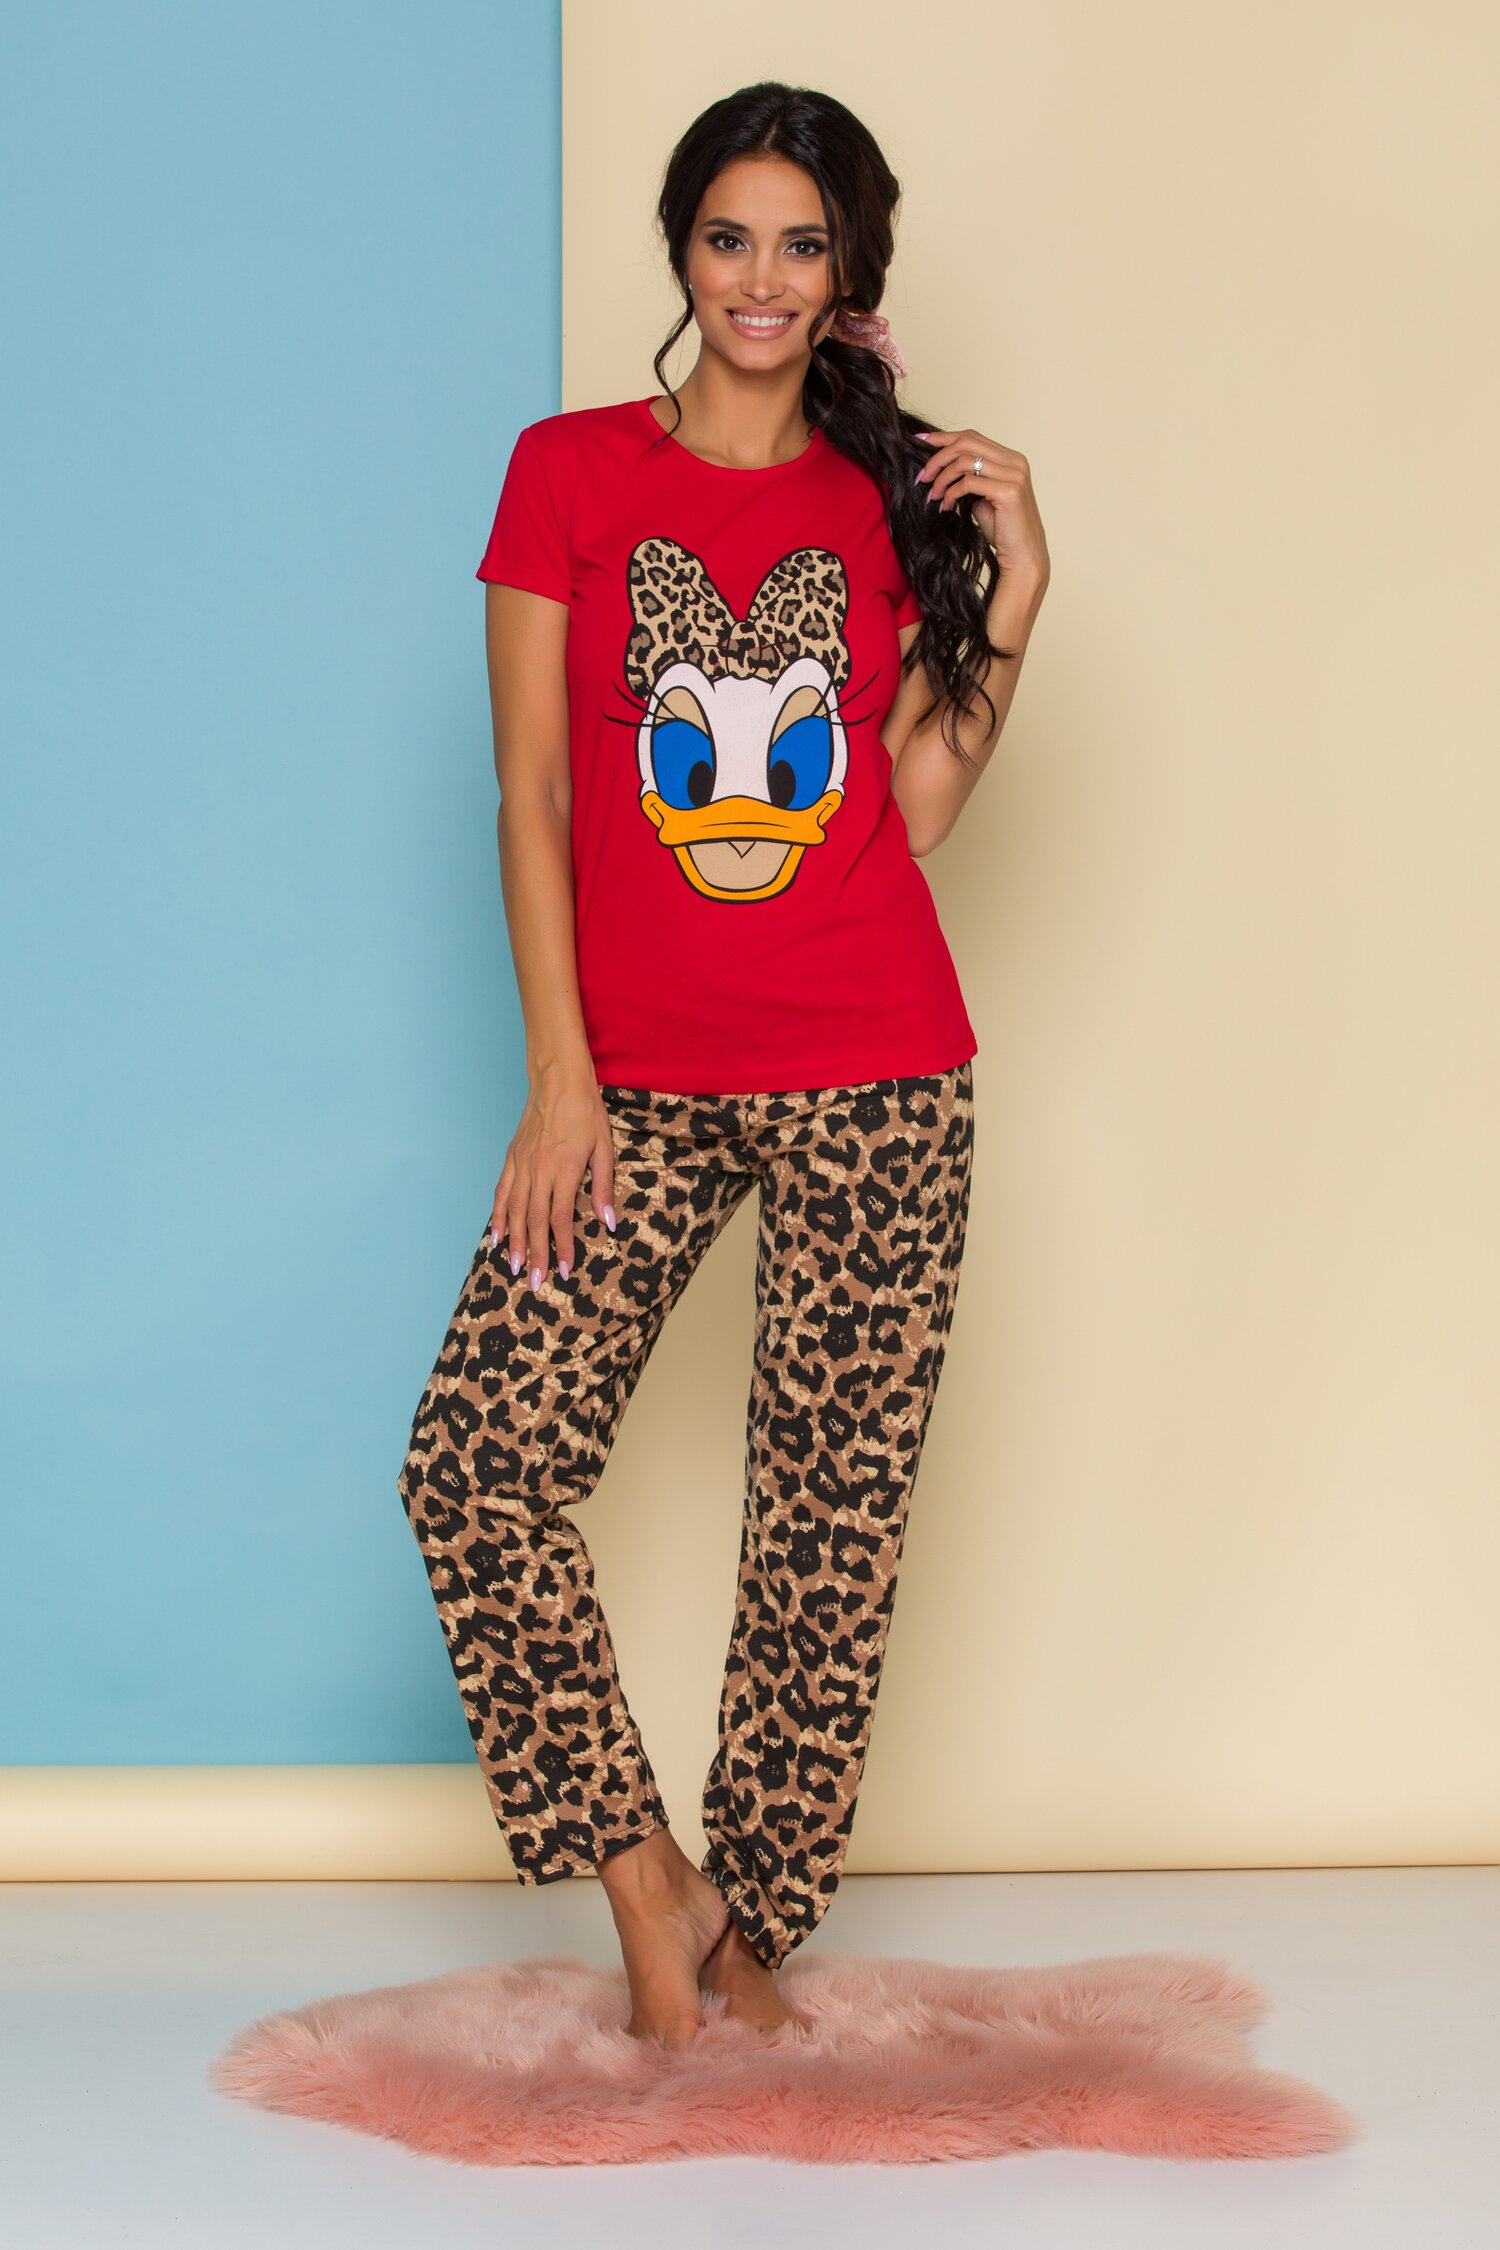 Pijama Daisy Duck cu tricou rosu si pantaloni cu animal print